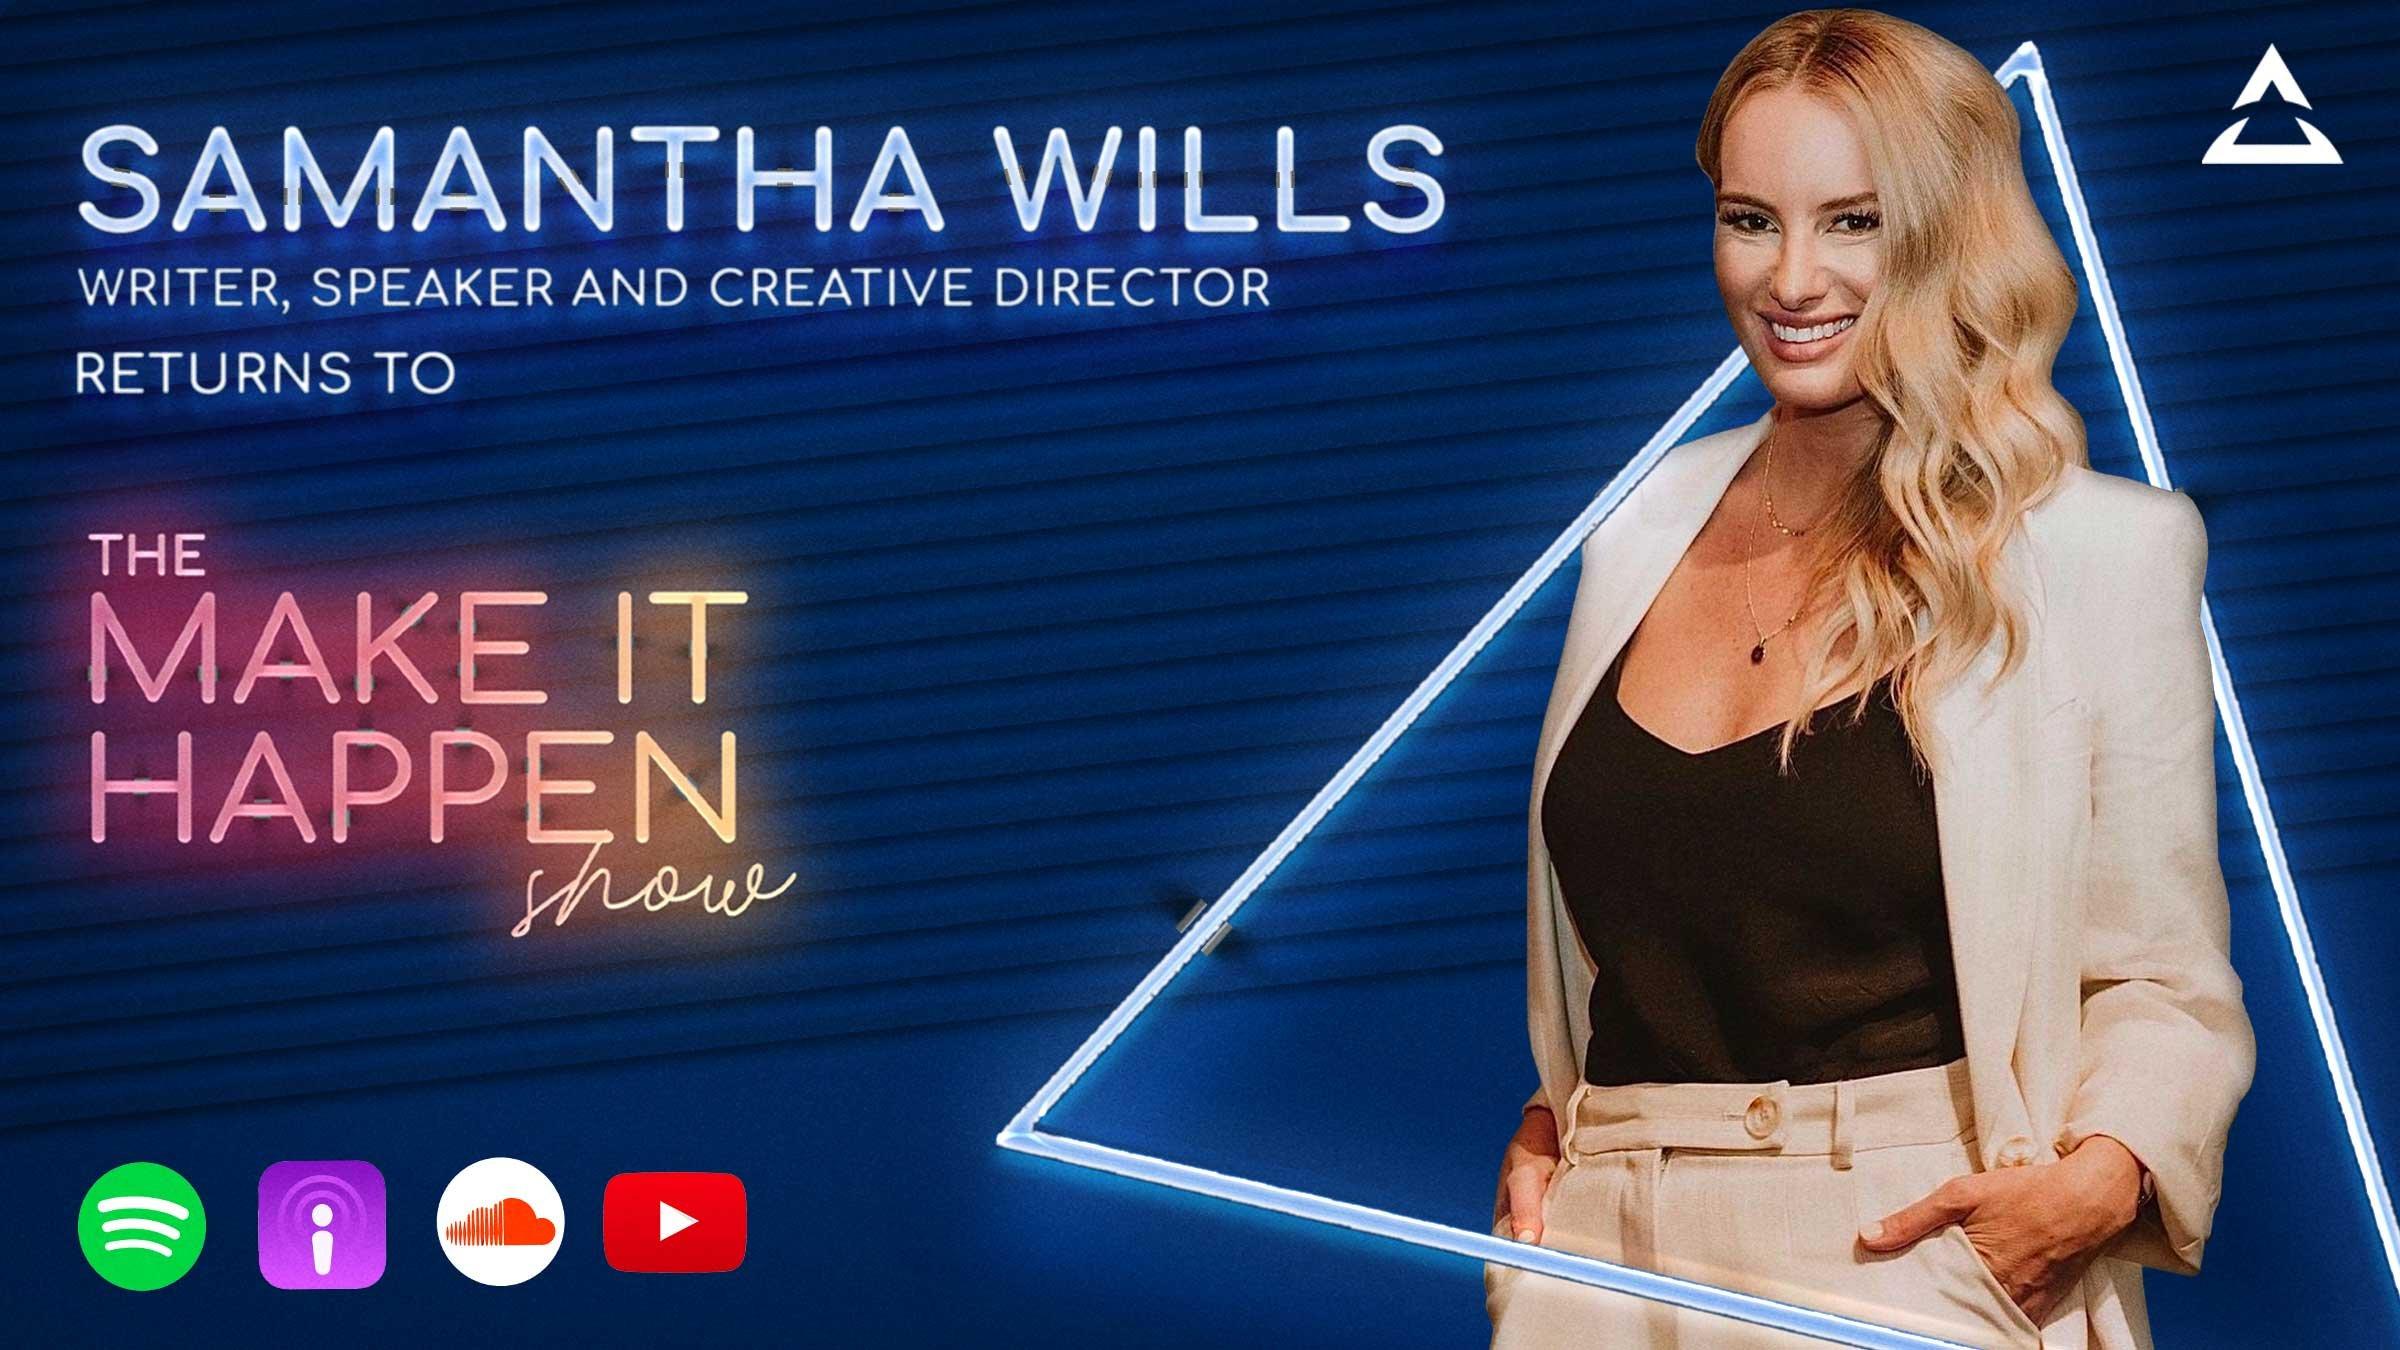 Samantha Wills, writer, speaker and creative director returns to The Make It Happen Show